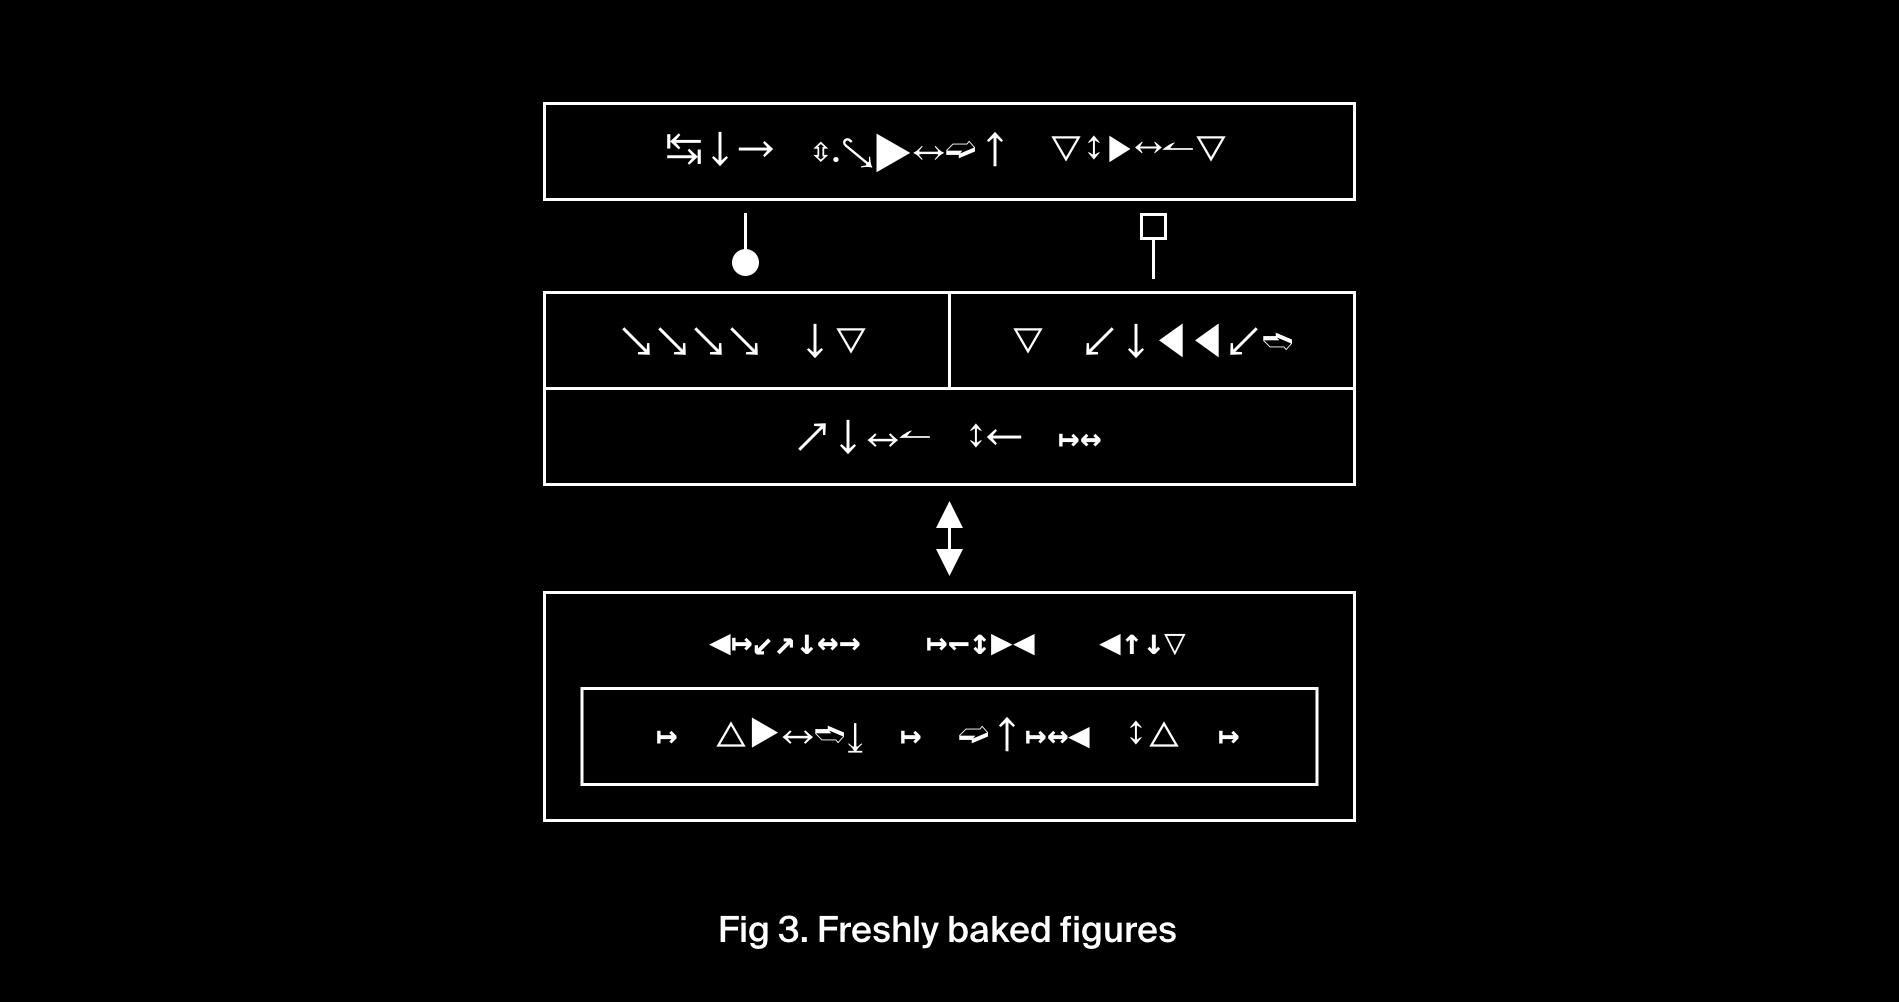 Fig 3. Freshly baked figures